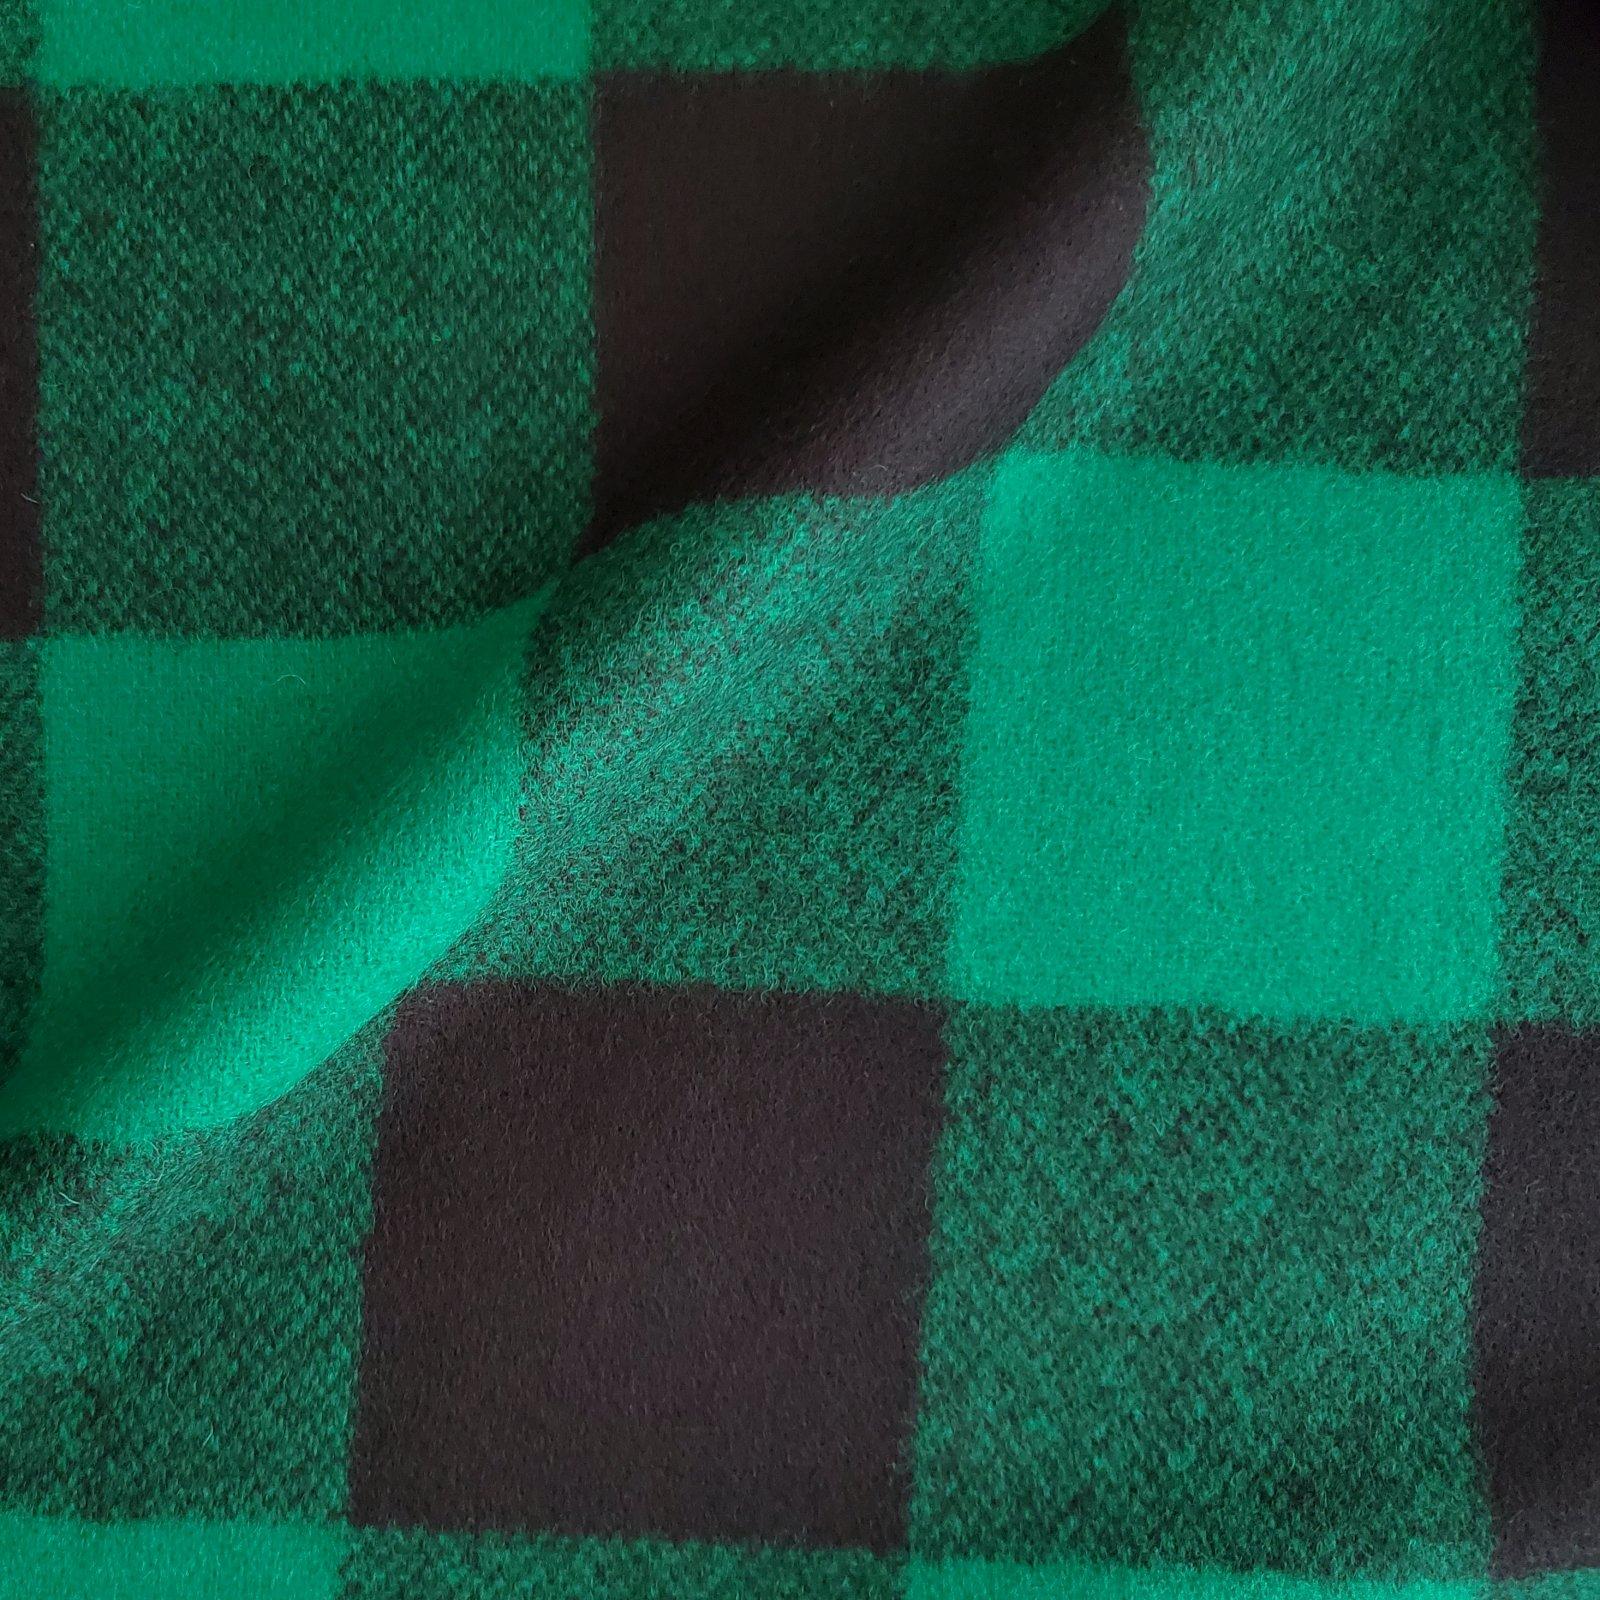 Fabric Wool Coating Green/Black Buffalo Check